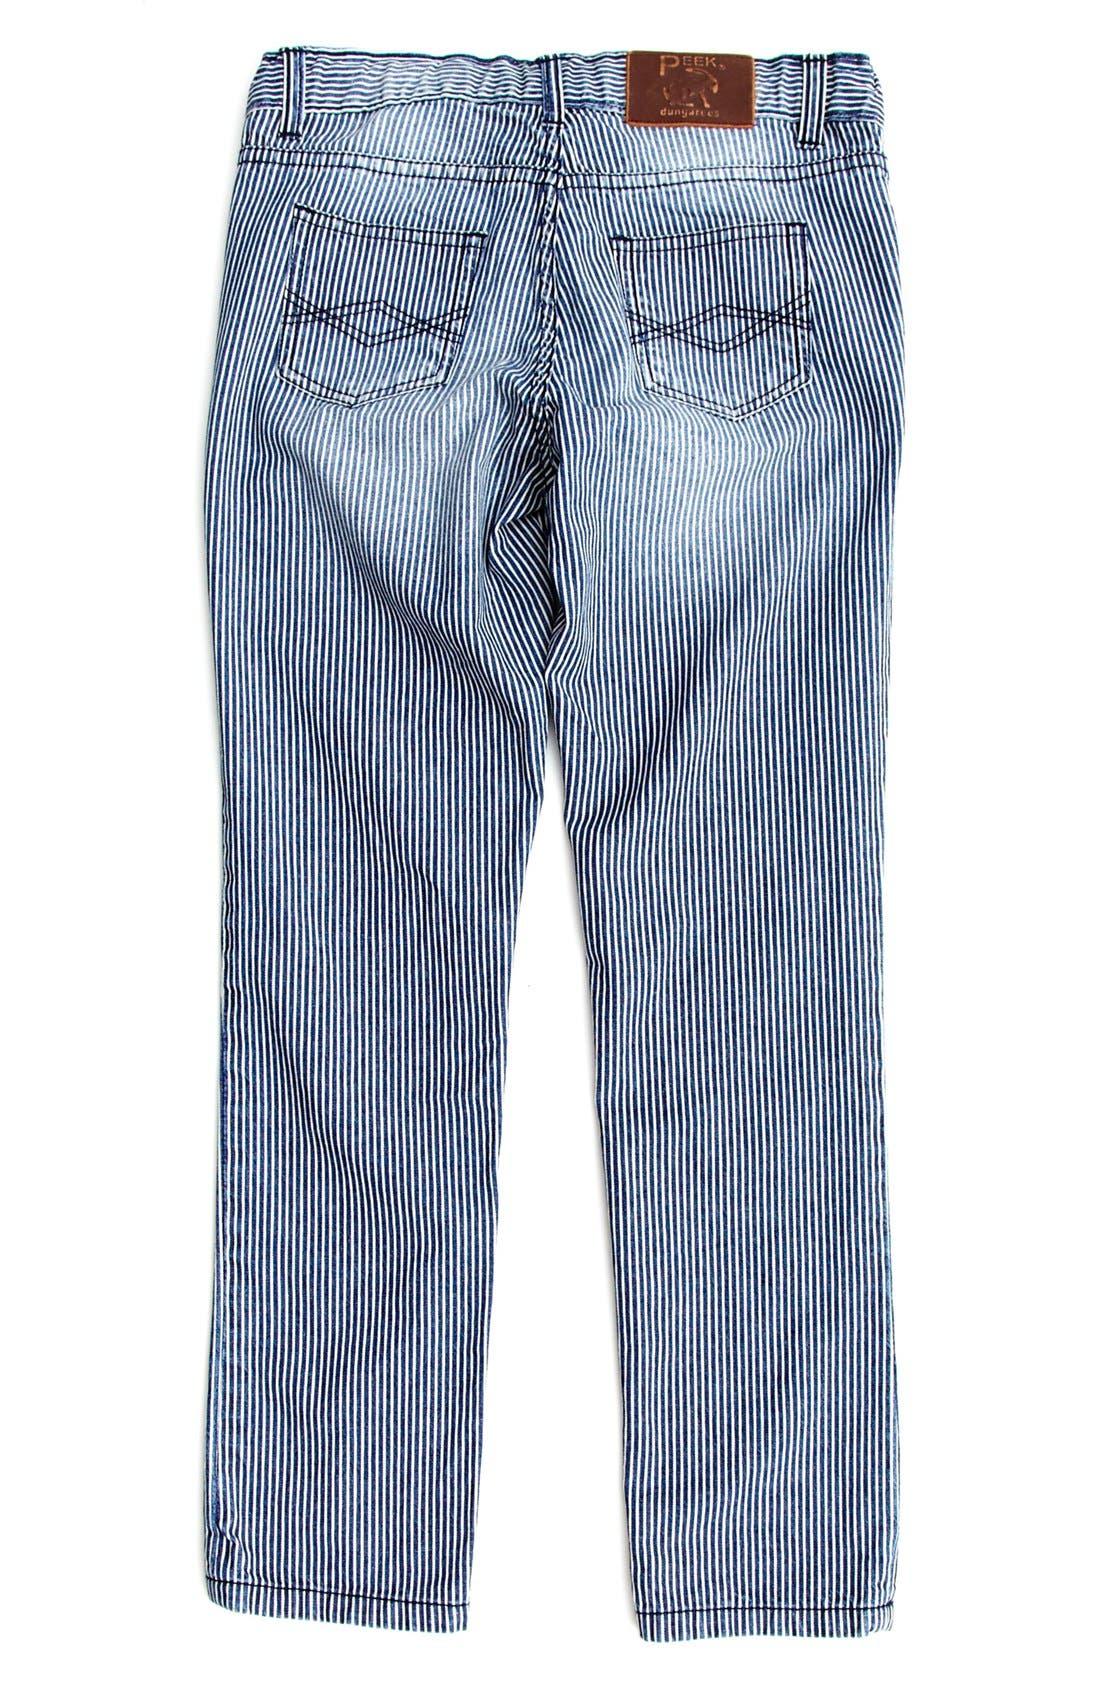 Alternate Image 1 Selected - Peek 'Margot' Railroad Stripe Skinny Jeans (Toddler Girls, Little Girls & Big Girls)